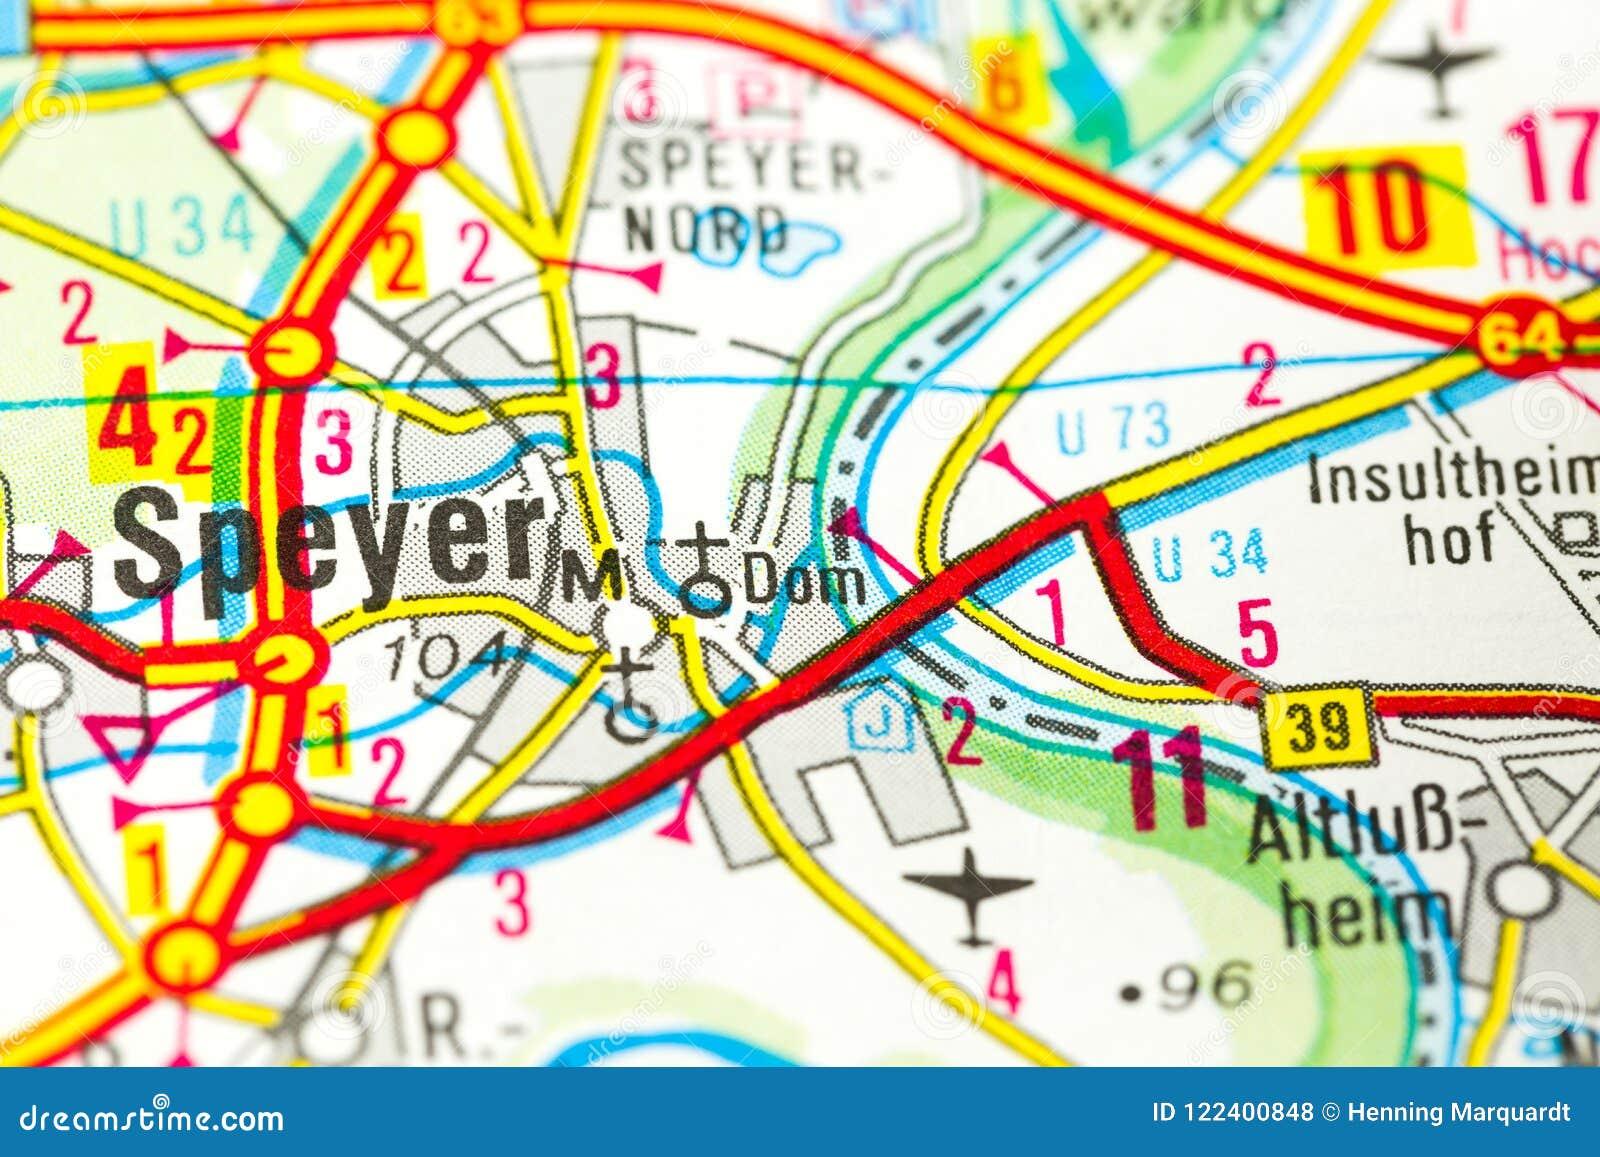 Cathédrale de Speyer sur la carte, Speyer, Rhénanie-Palatinat